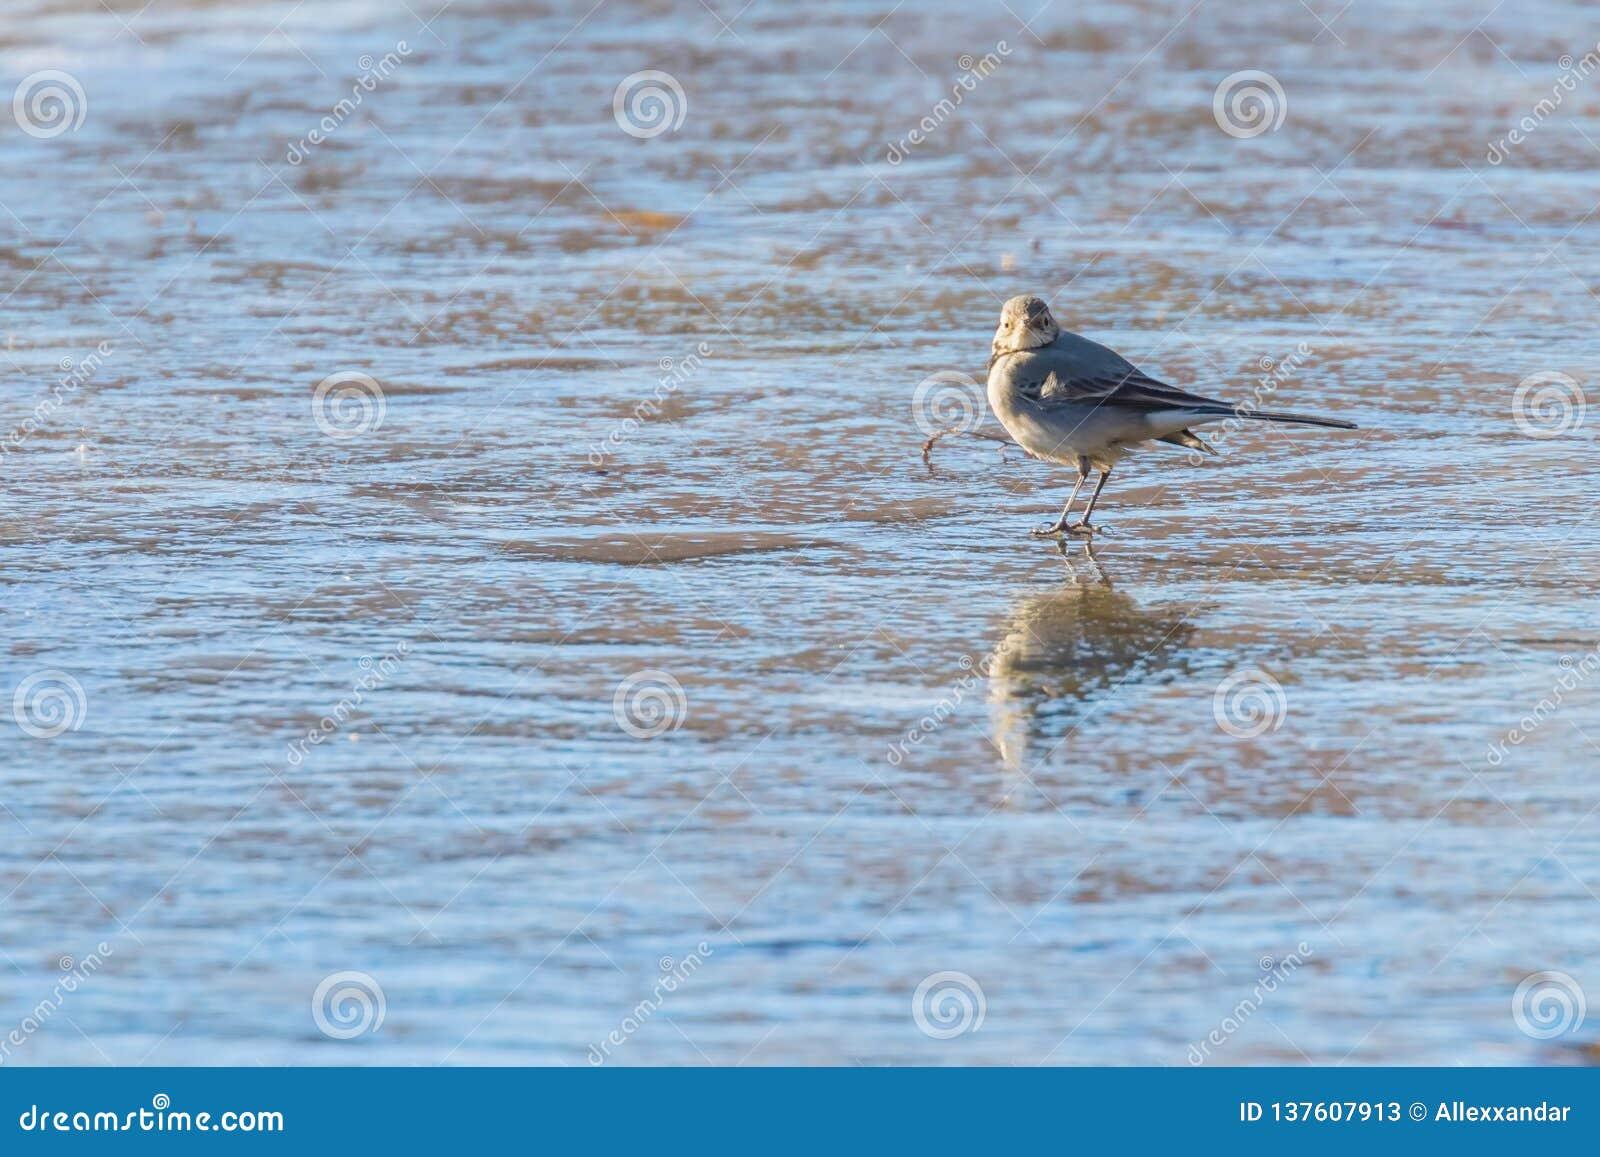 White Wagtail, Cute little bird Motacilla alba on ice, frozen pond winter